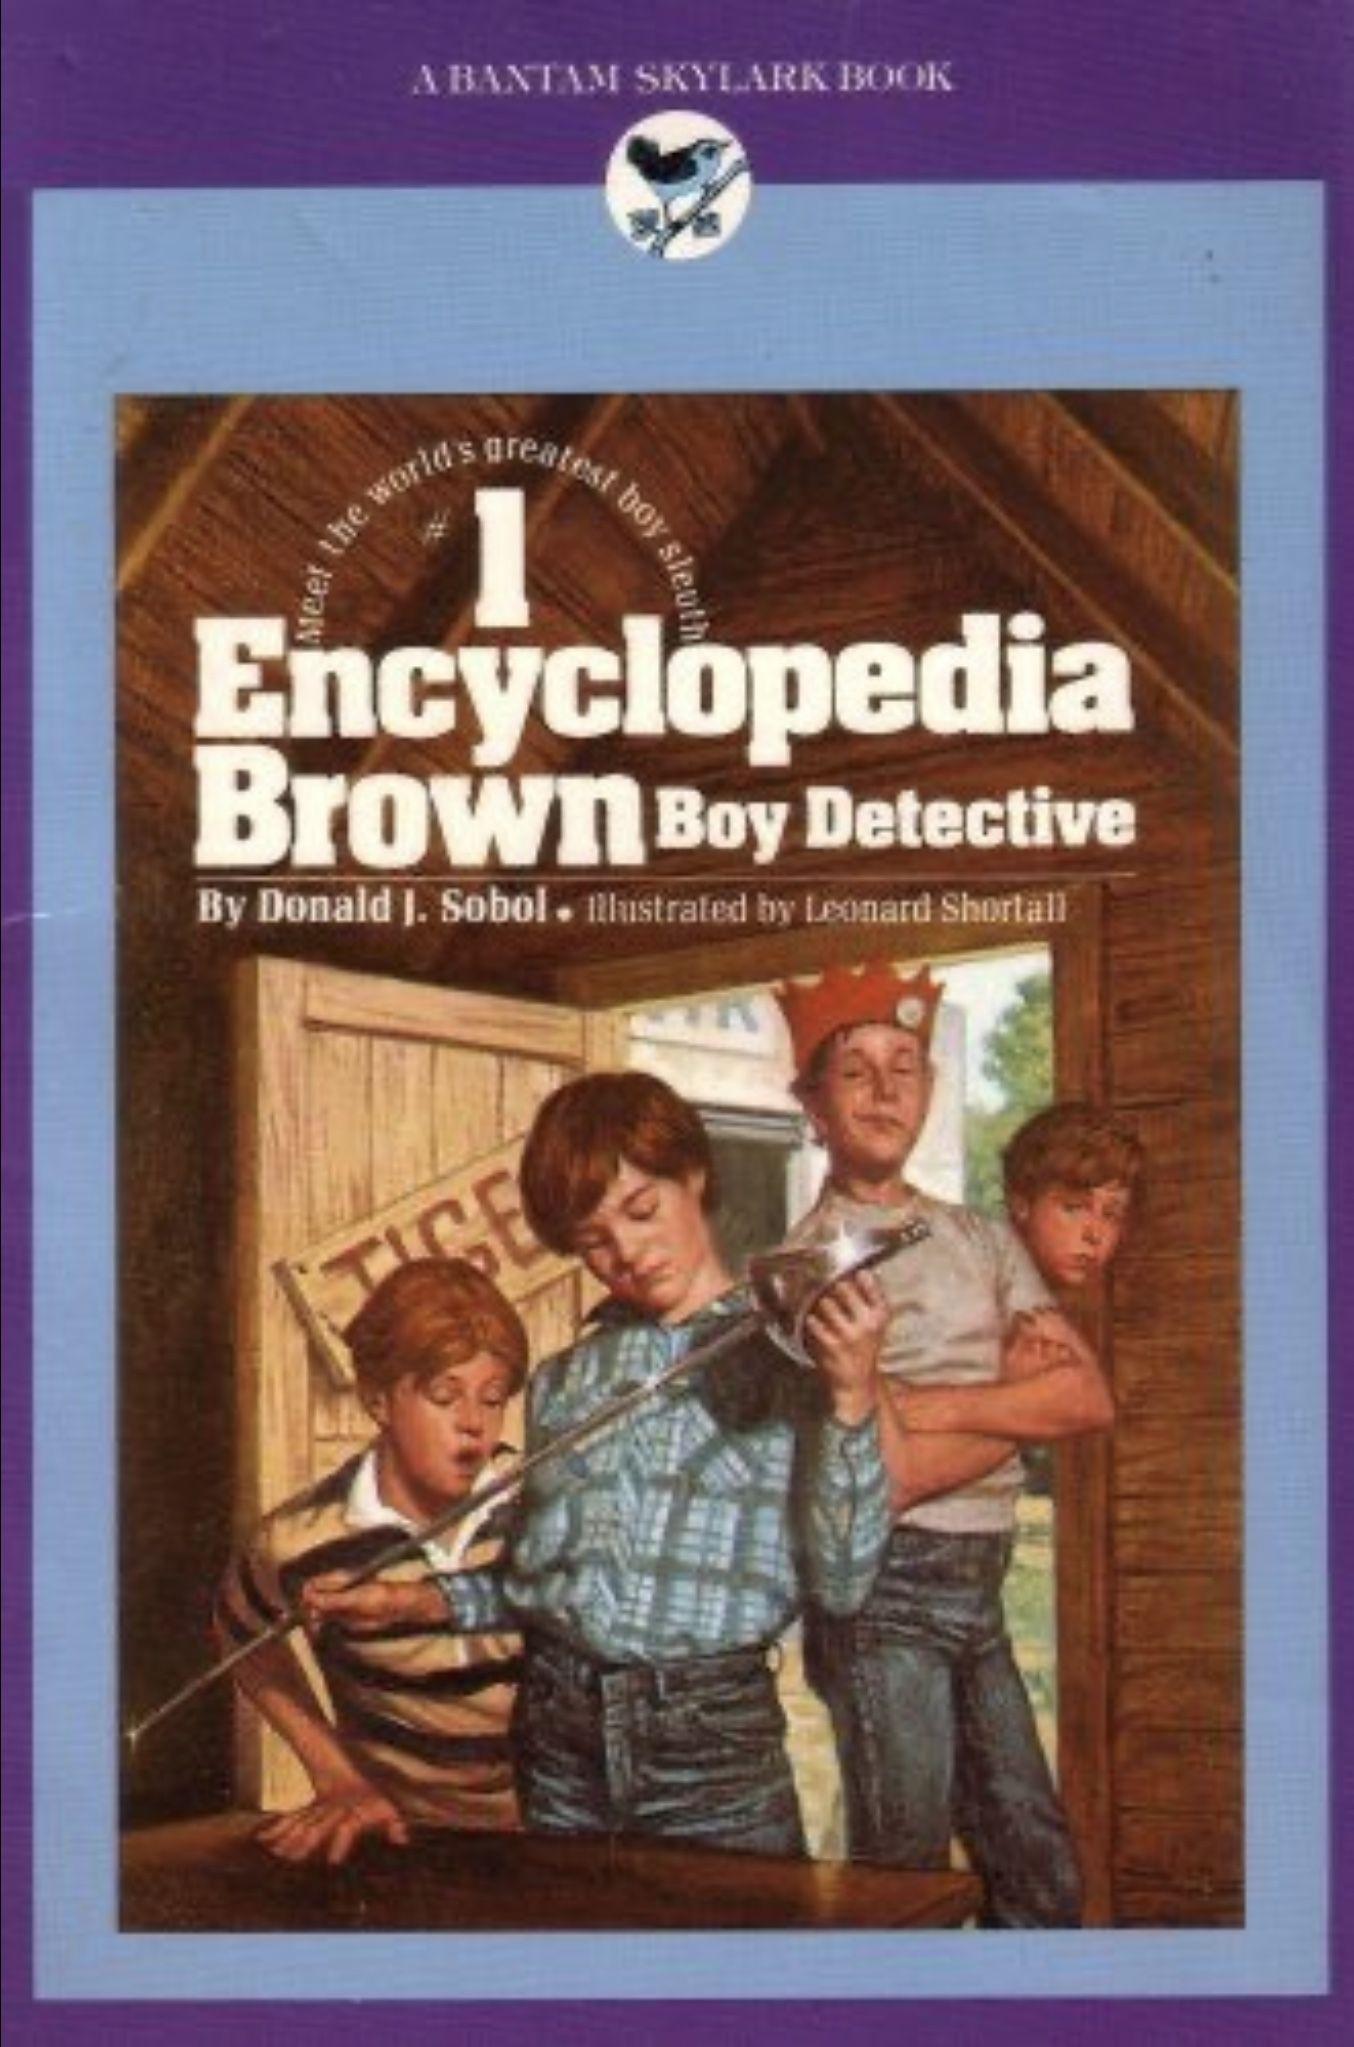 Encyclopedia brown boy detective by donald j sobol 1985